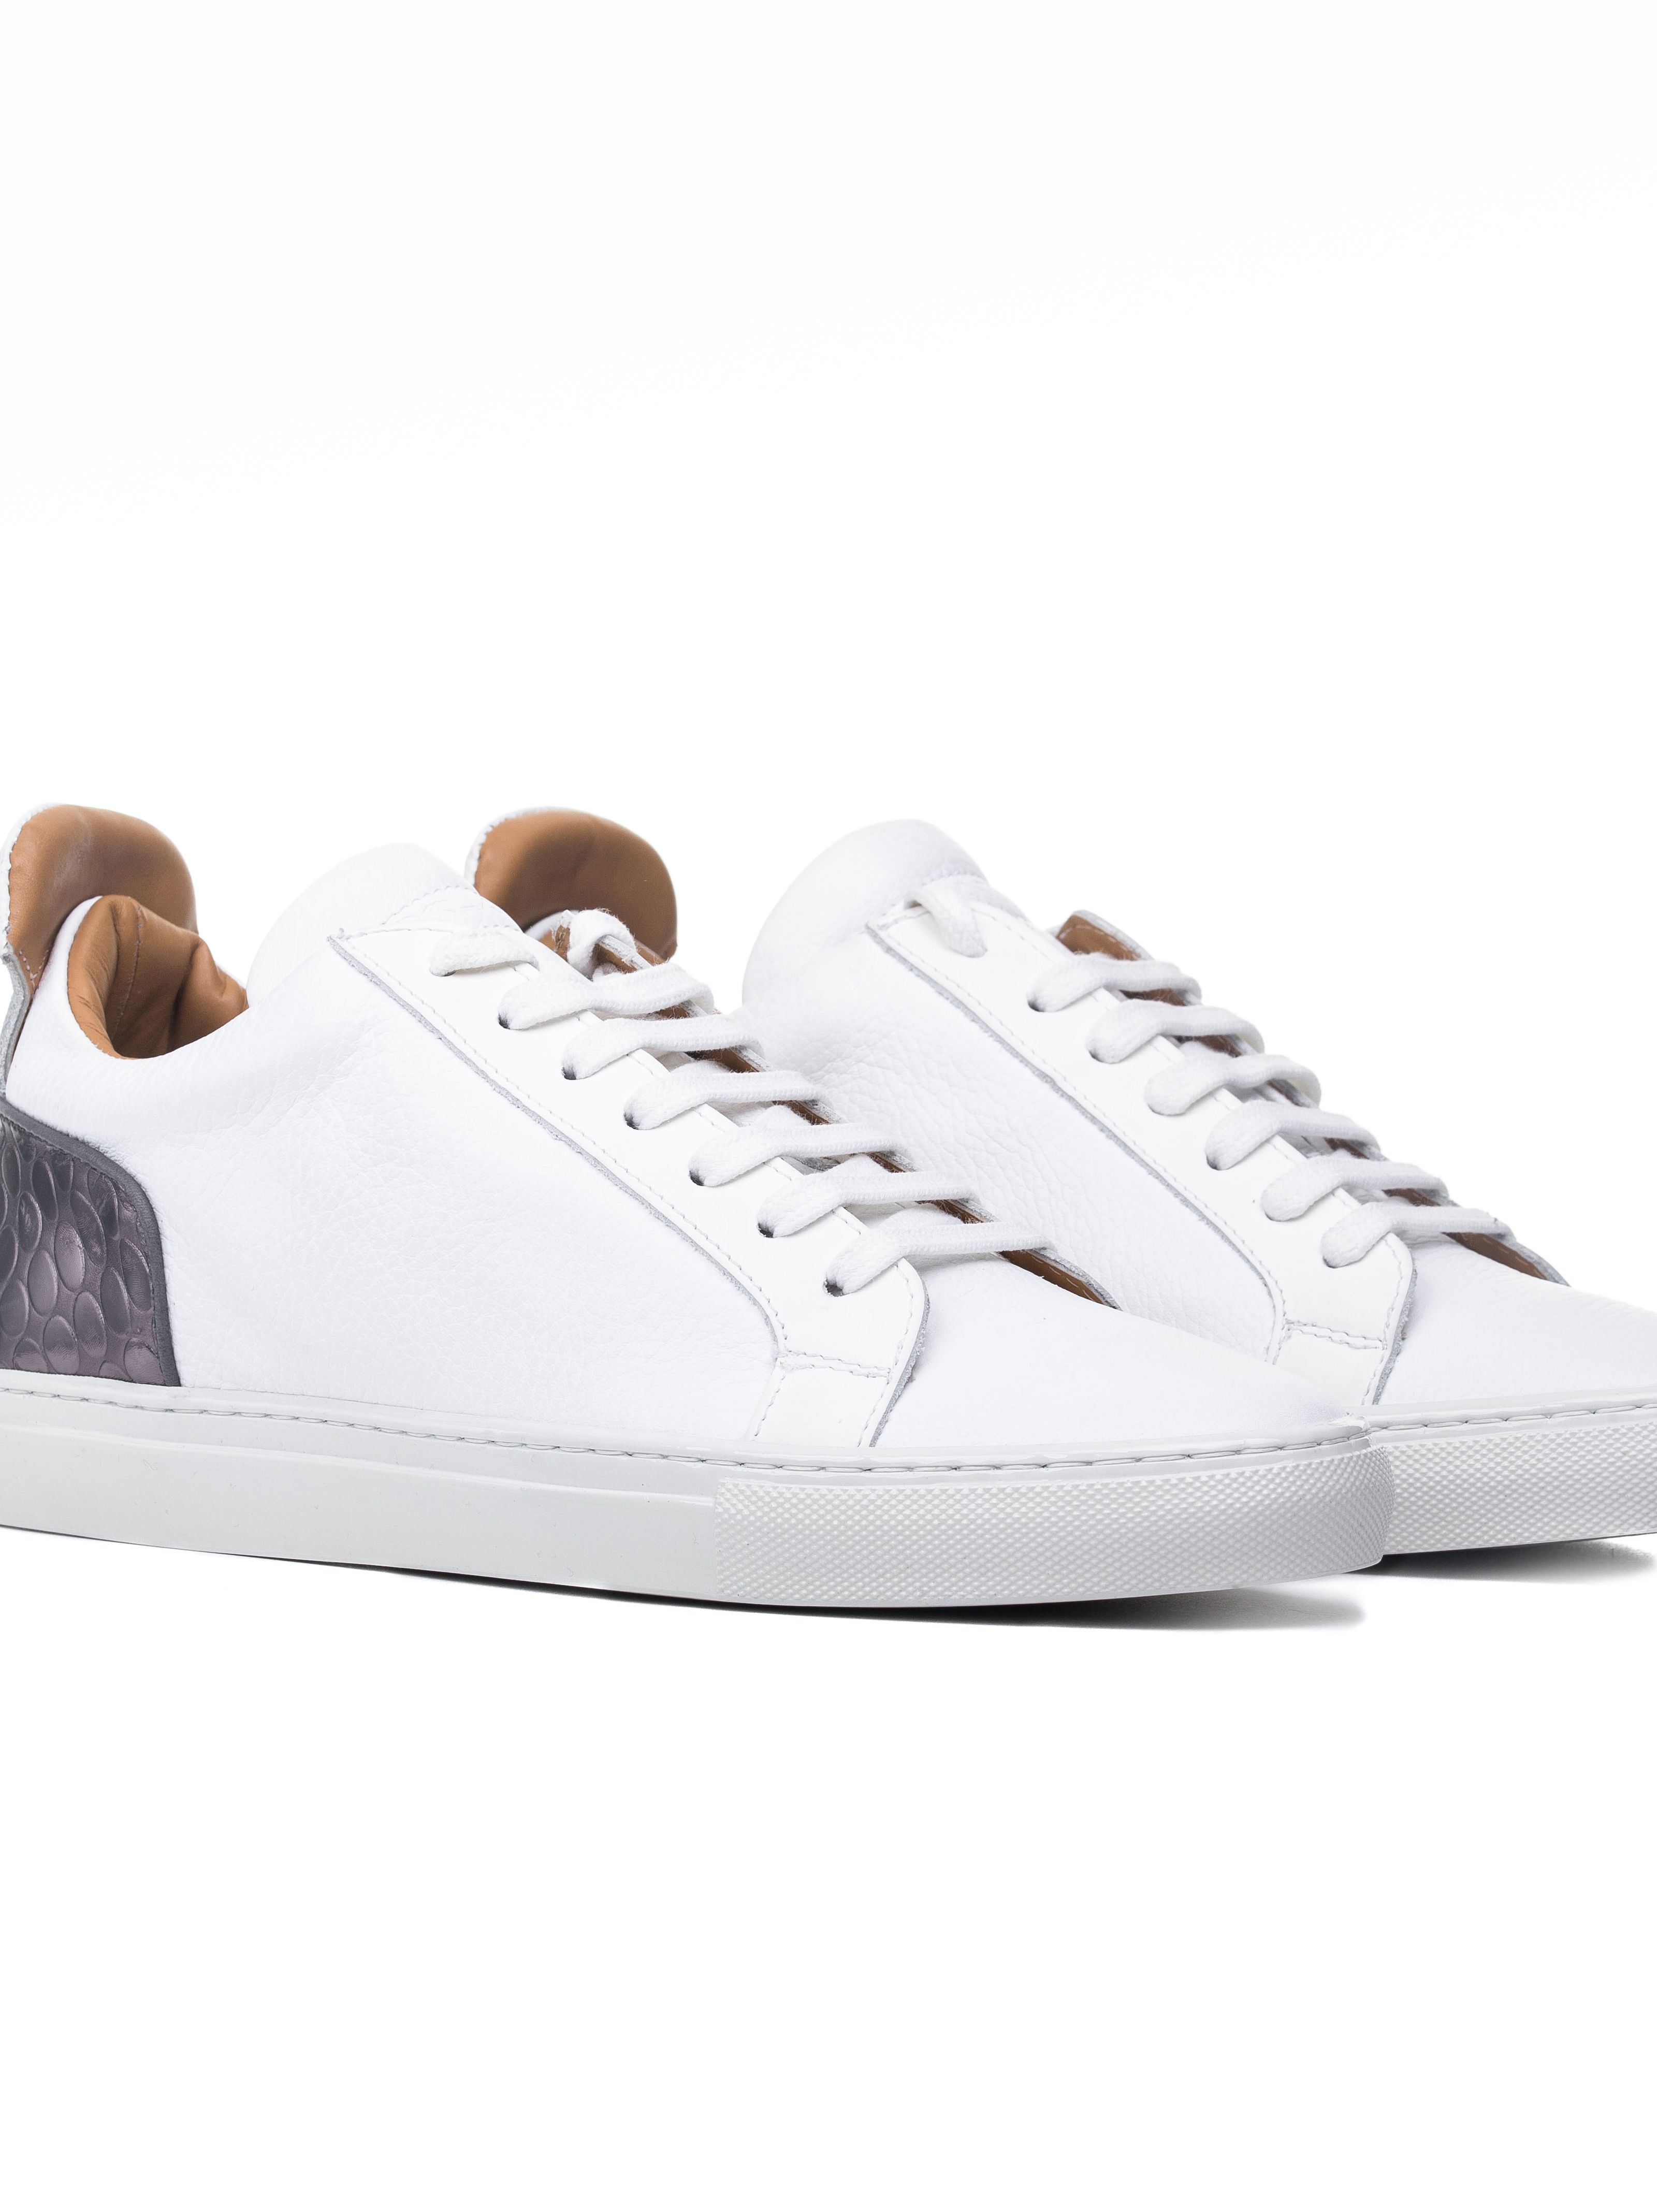 Ylati 3015 Amalfi 2.0 White Leather & Metal Bubble Low Sneakers